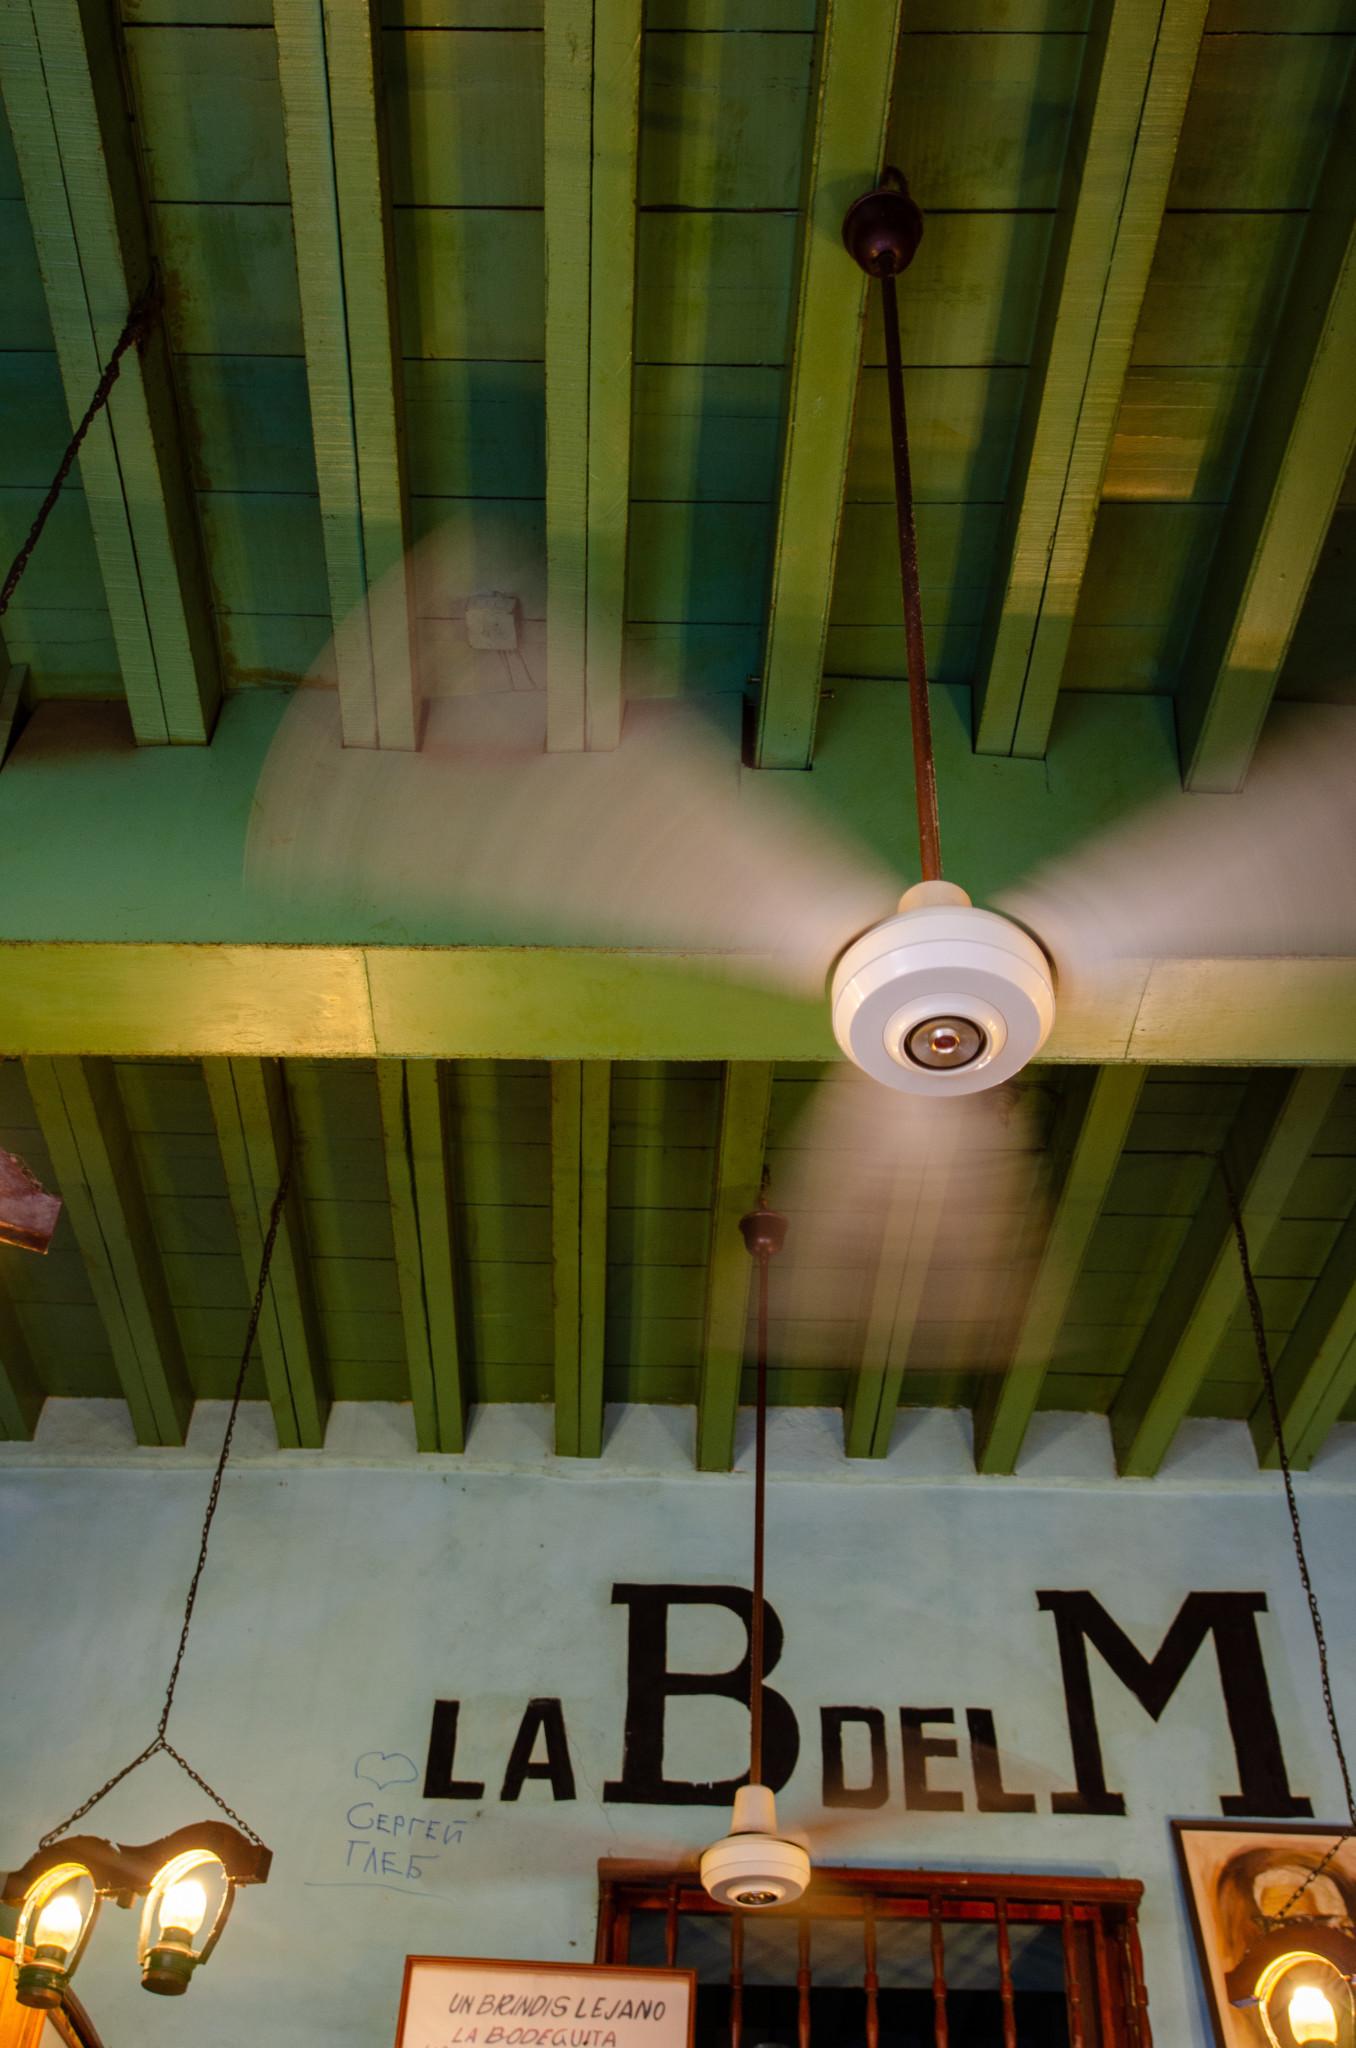 La Bodeguita del Media in Habana Vieja